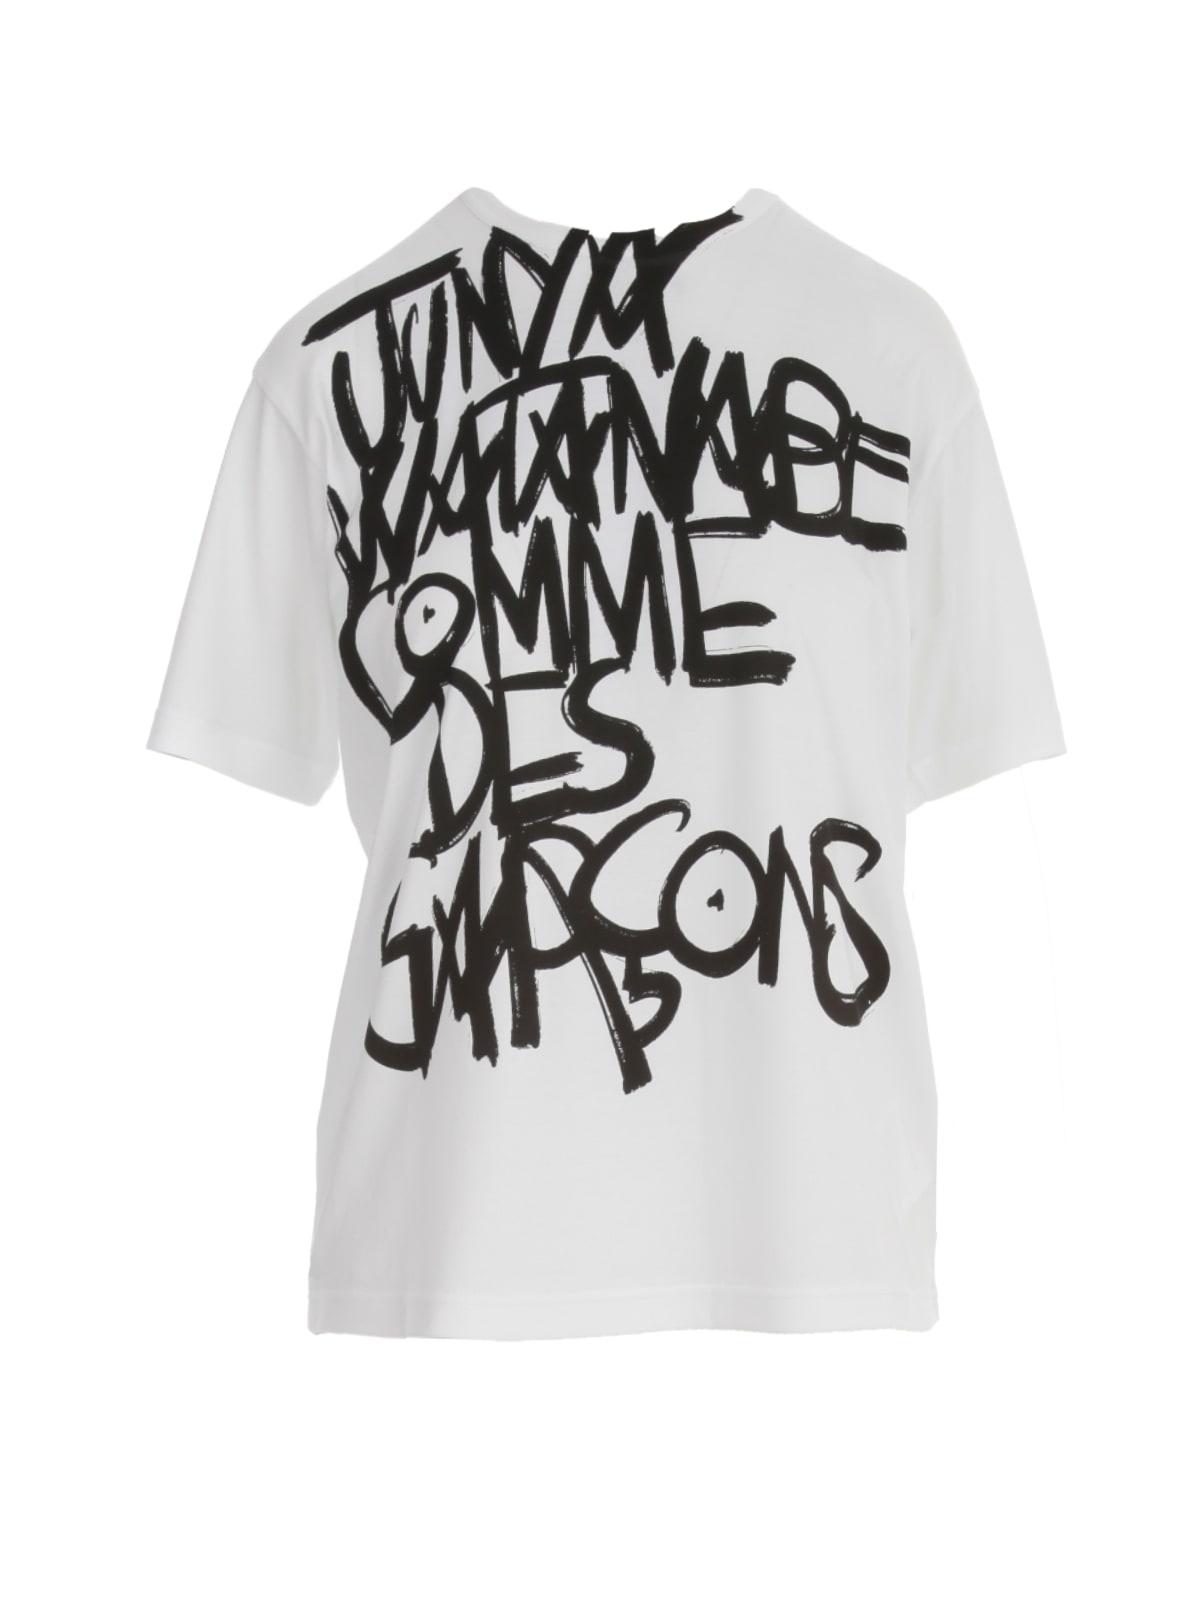 Printed S/s T-shirt